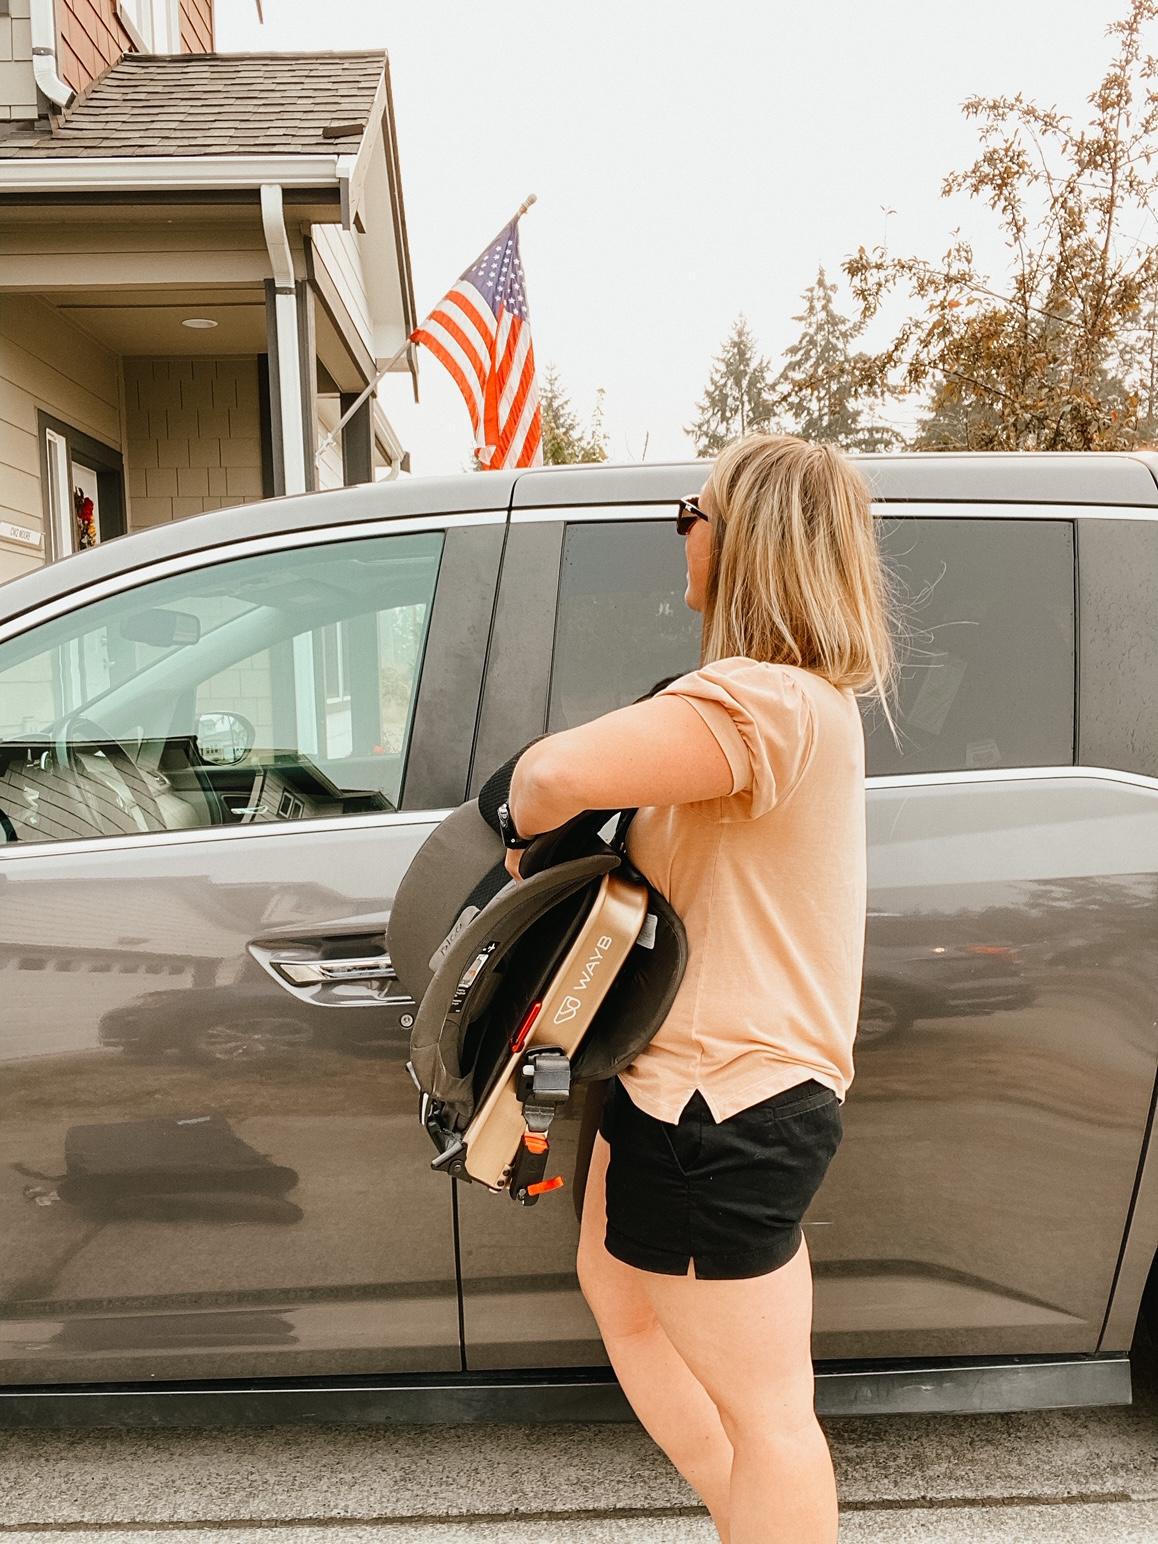 wayb pico car seat review